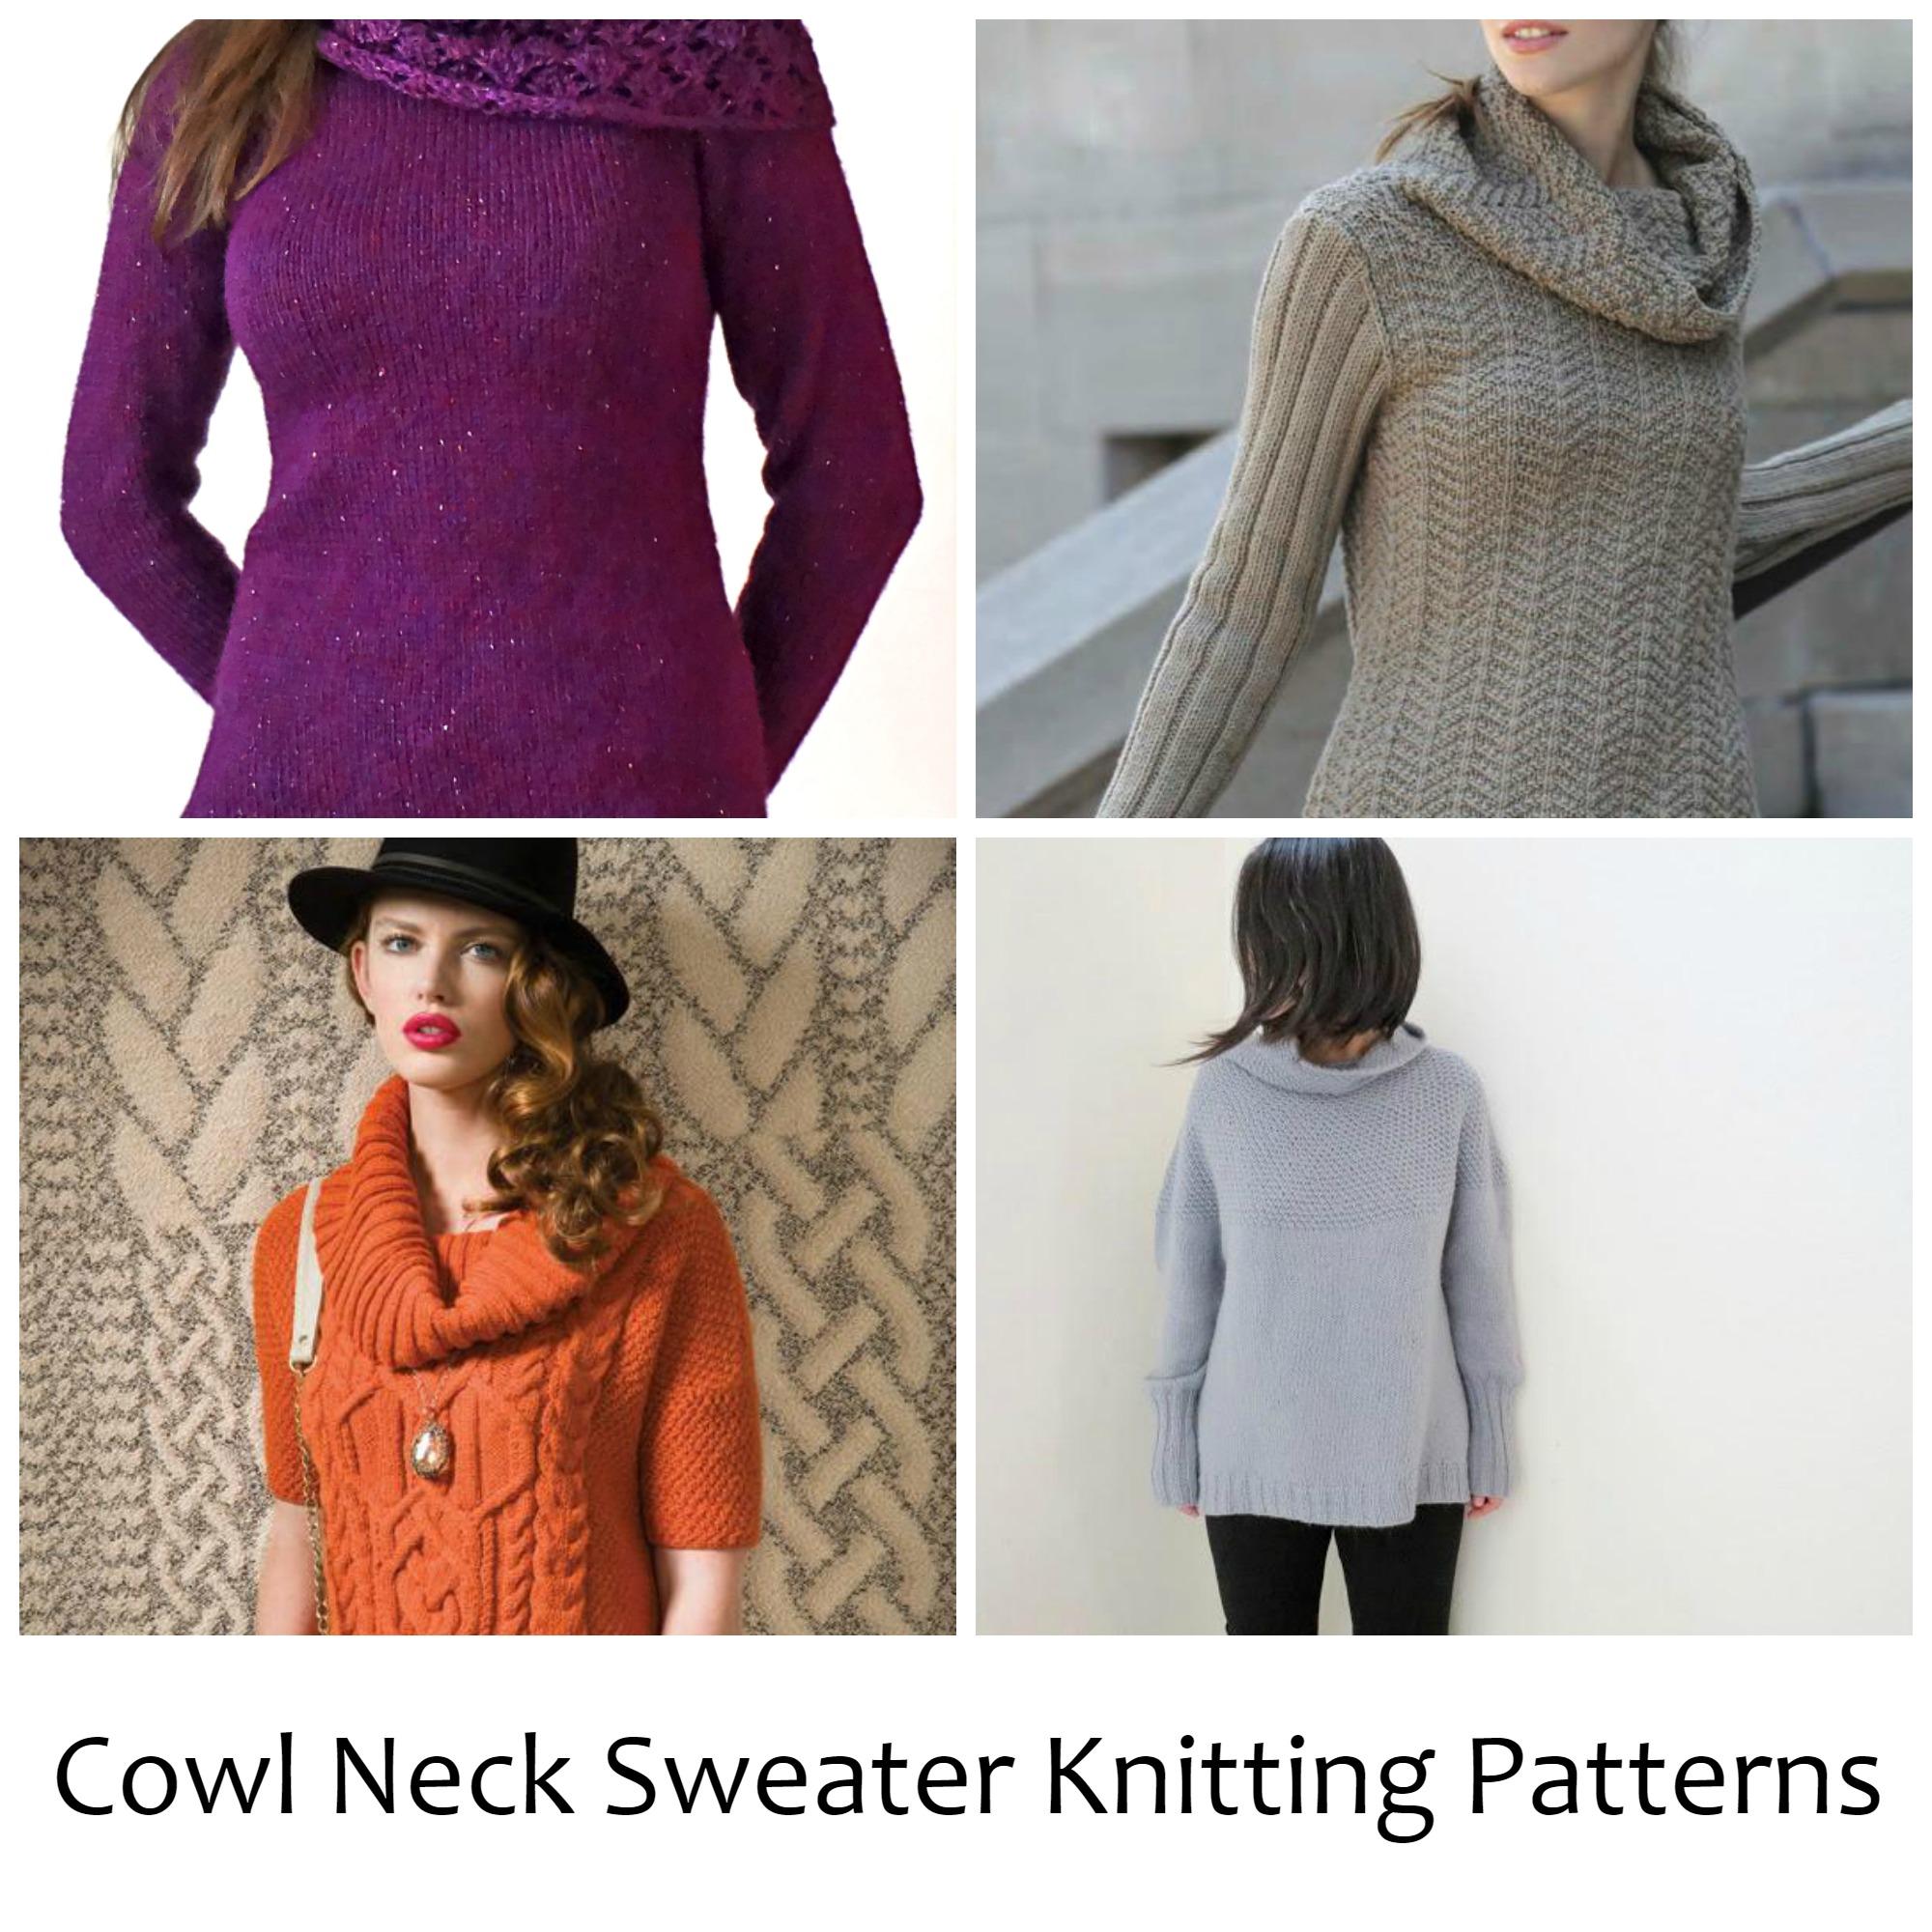 Cowl Neck Sweater Knitting Patterns